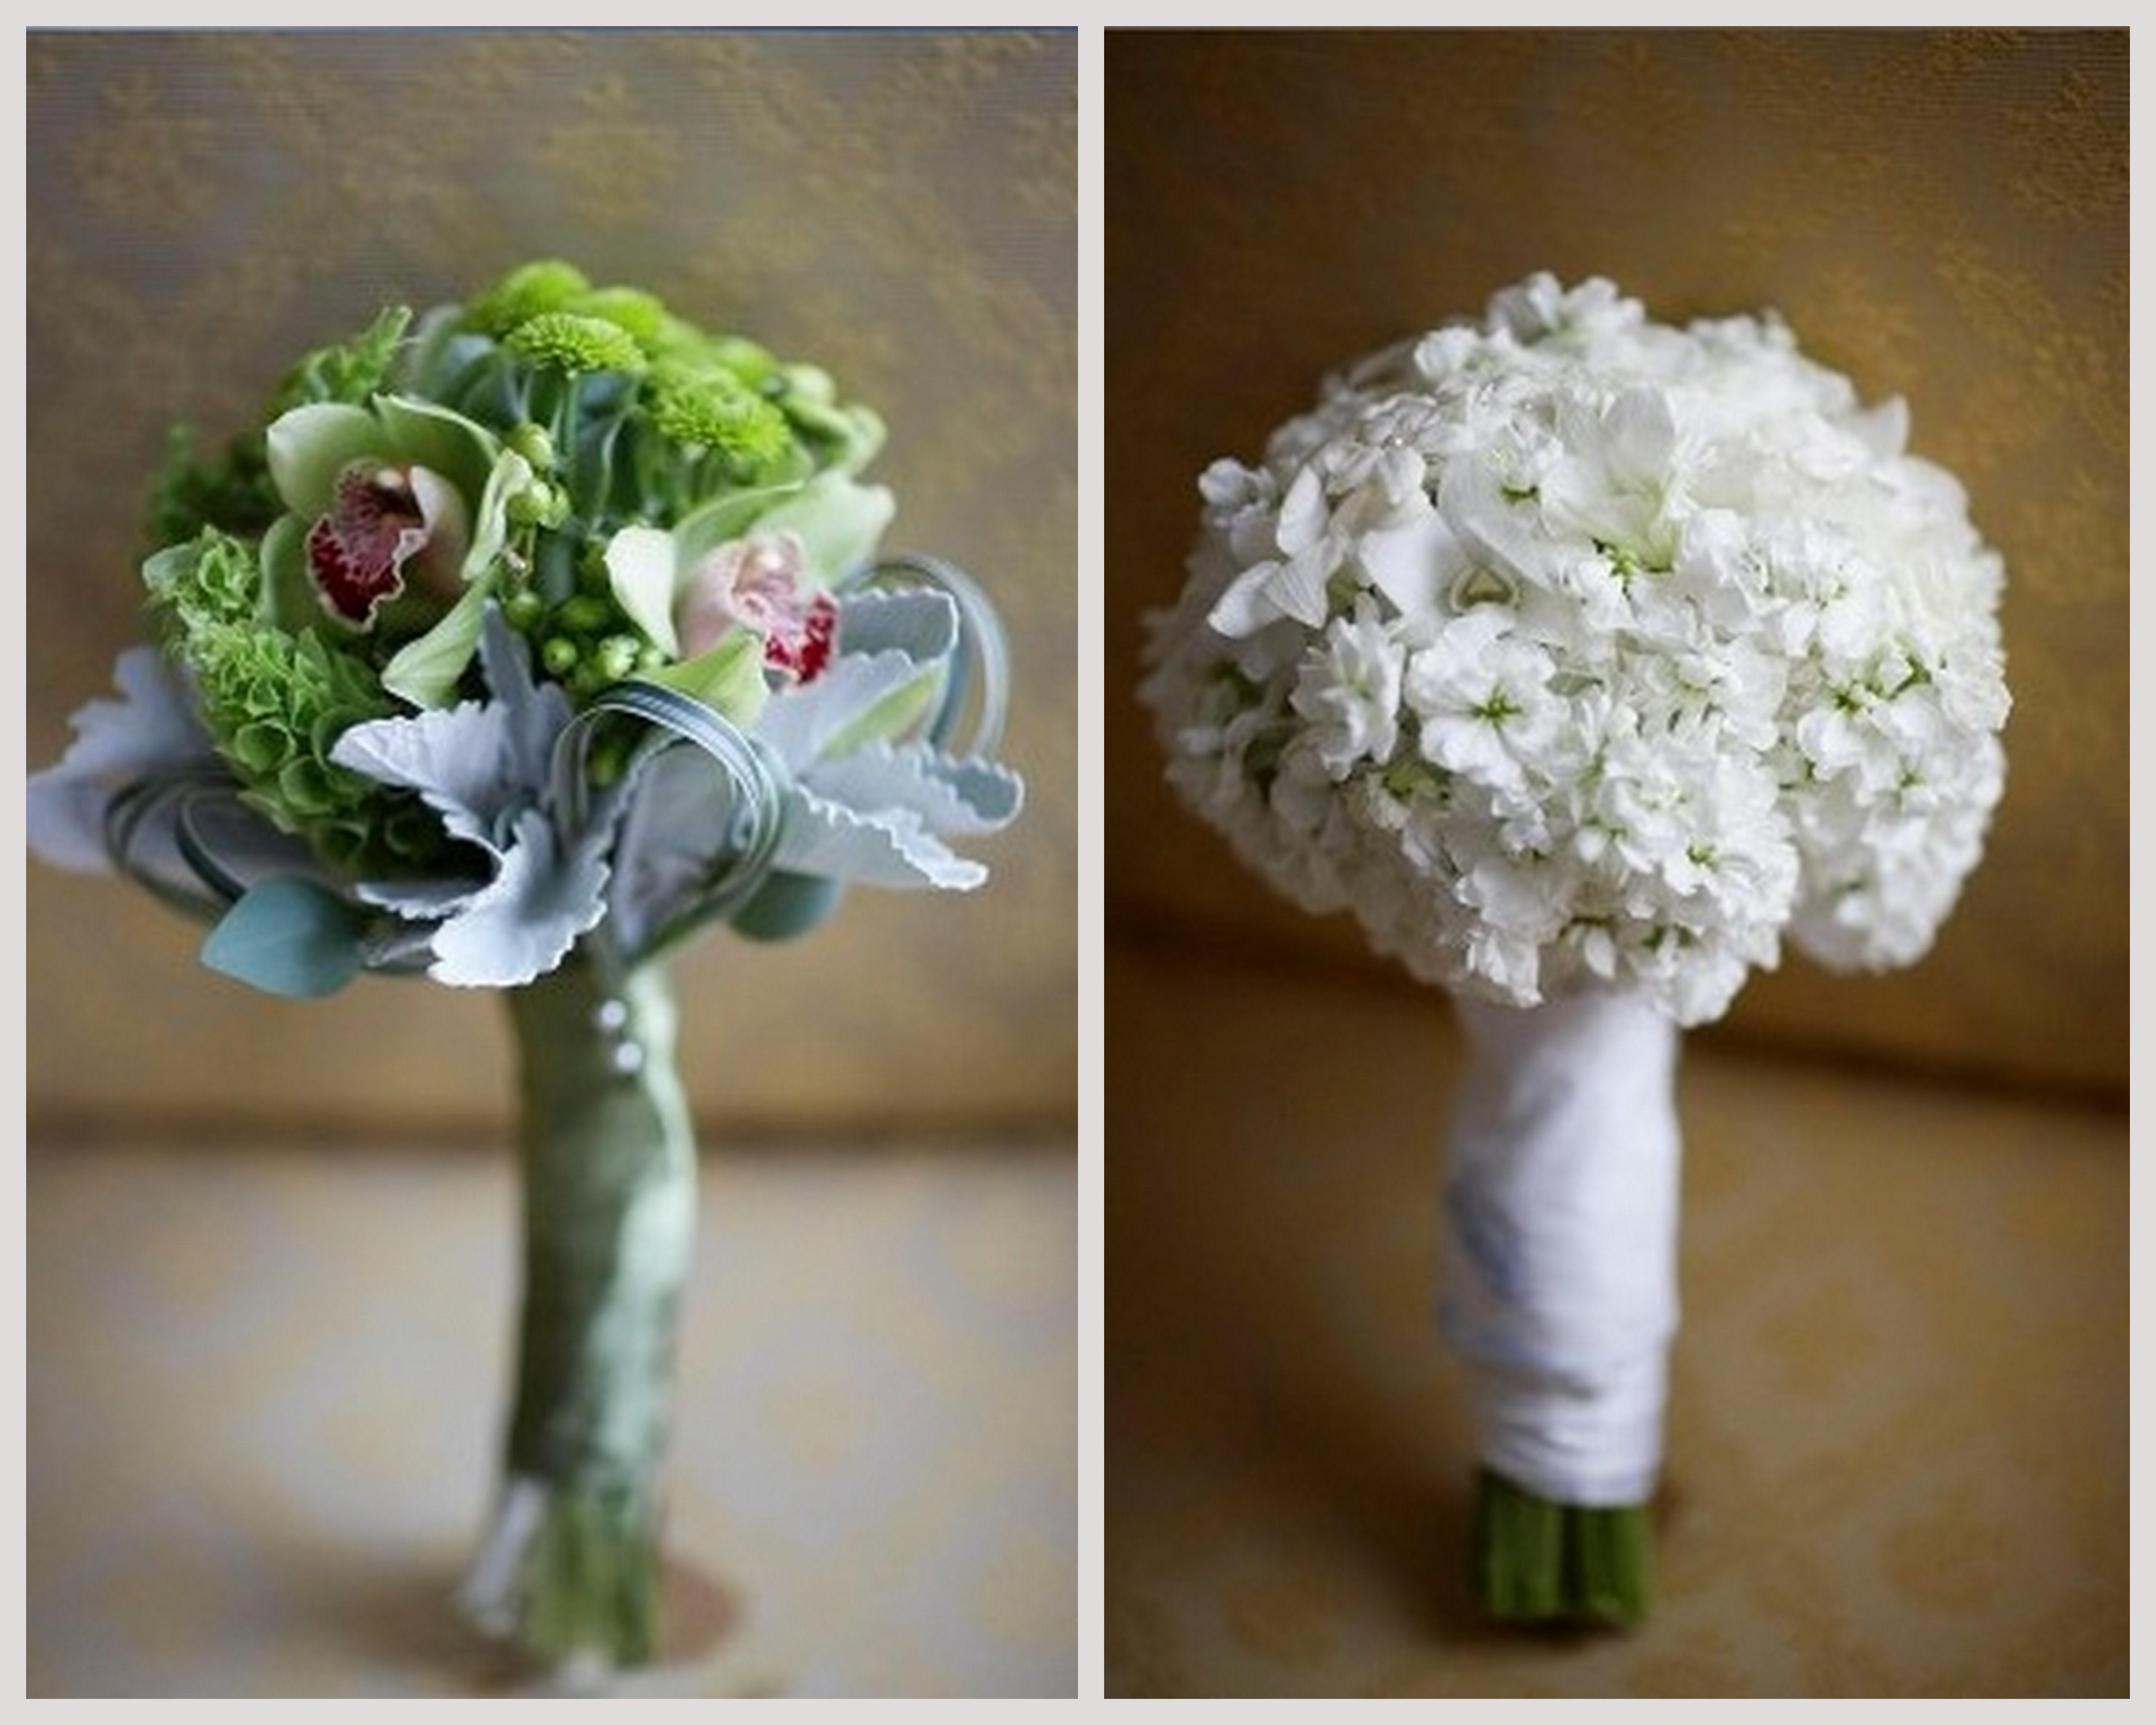 Wedding flowers by Scarlet Petal Florist Chicago, IL: Effortless Events